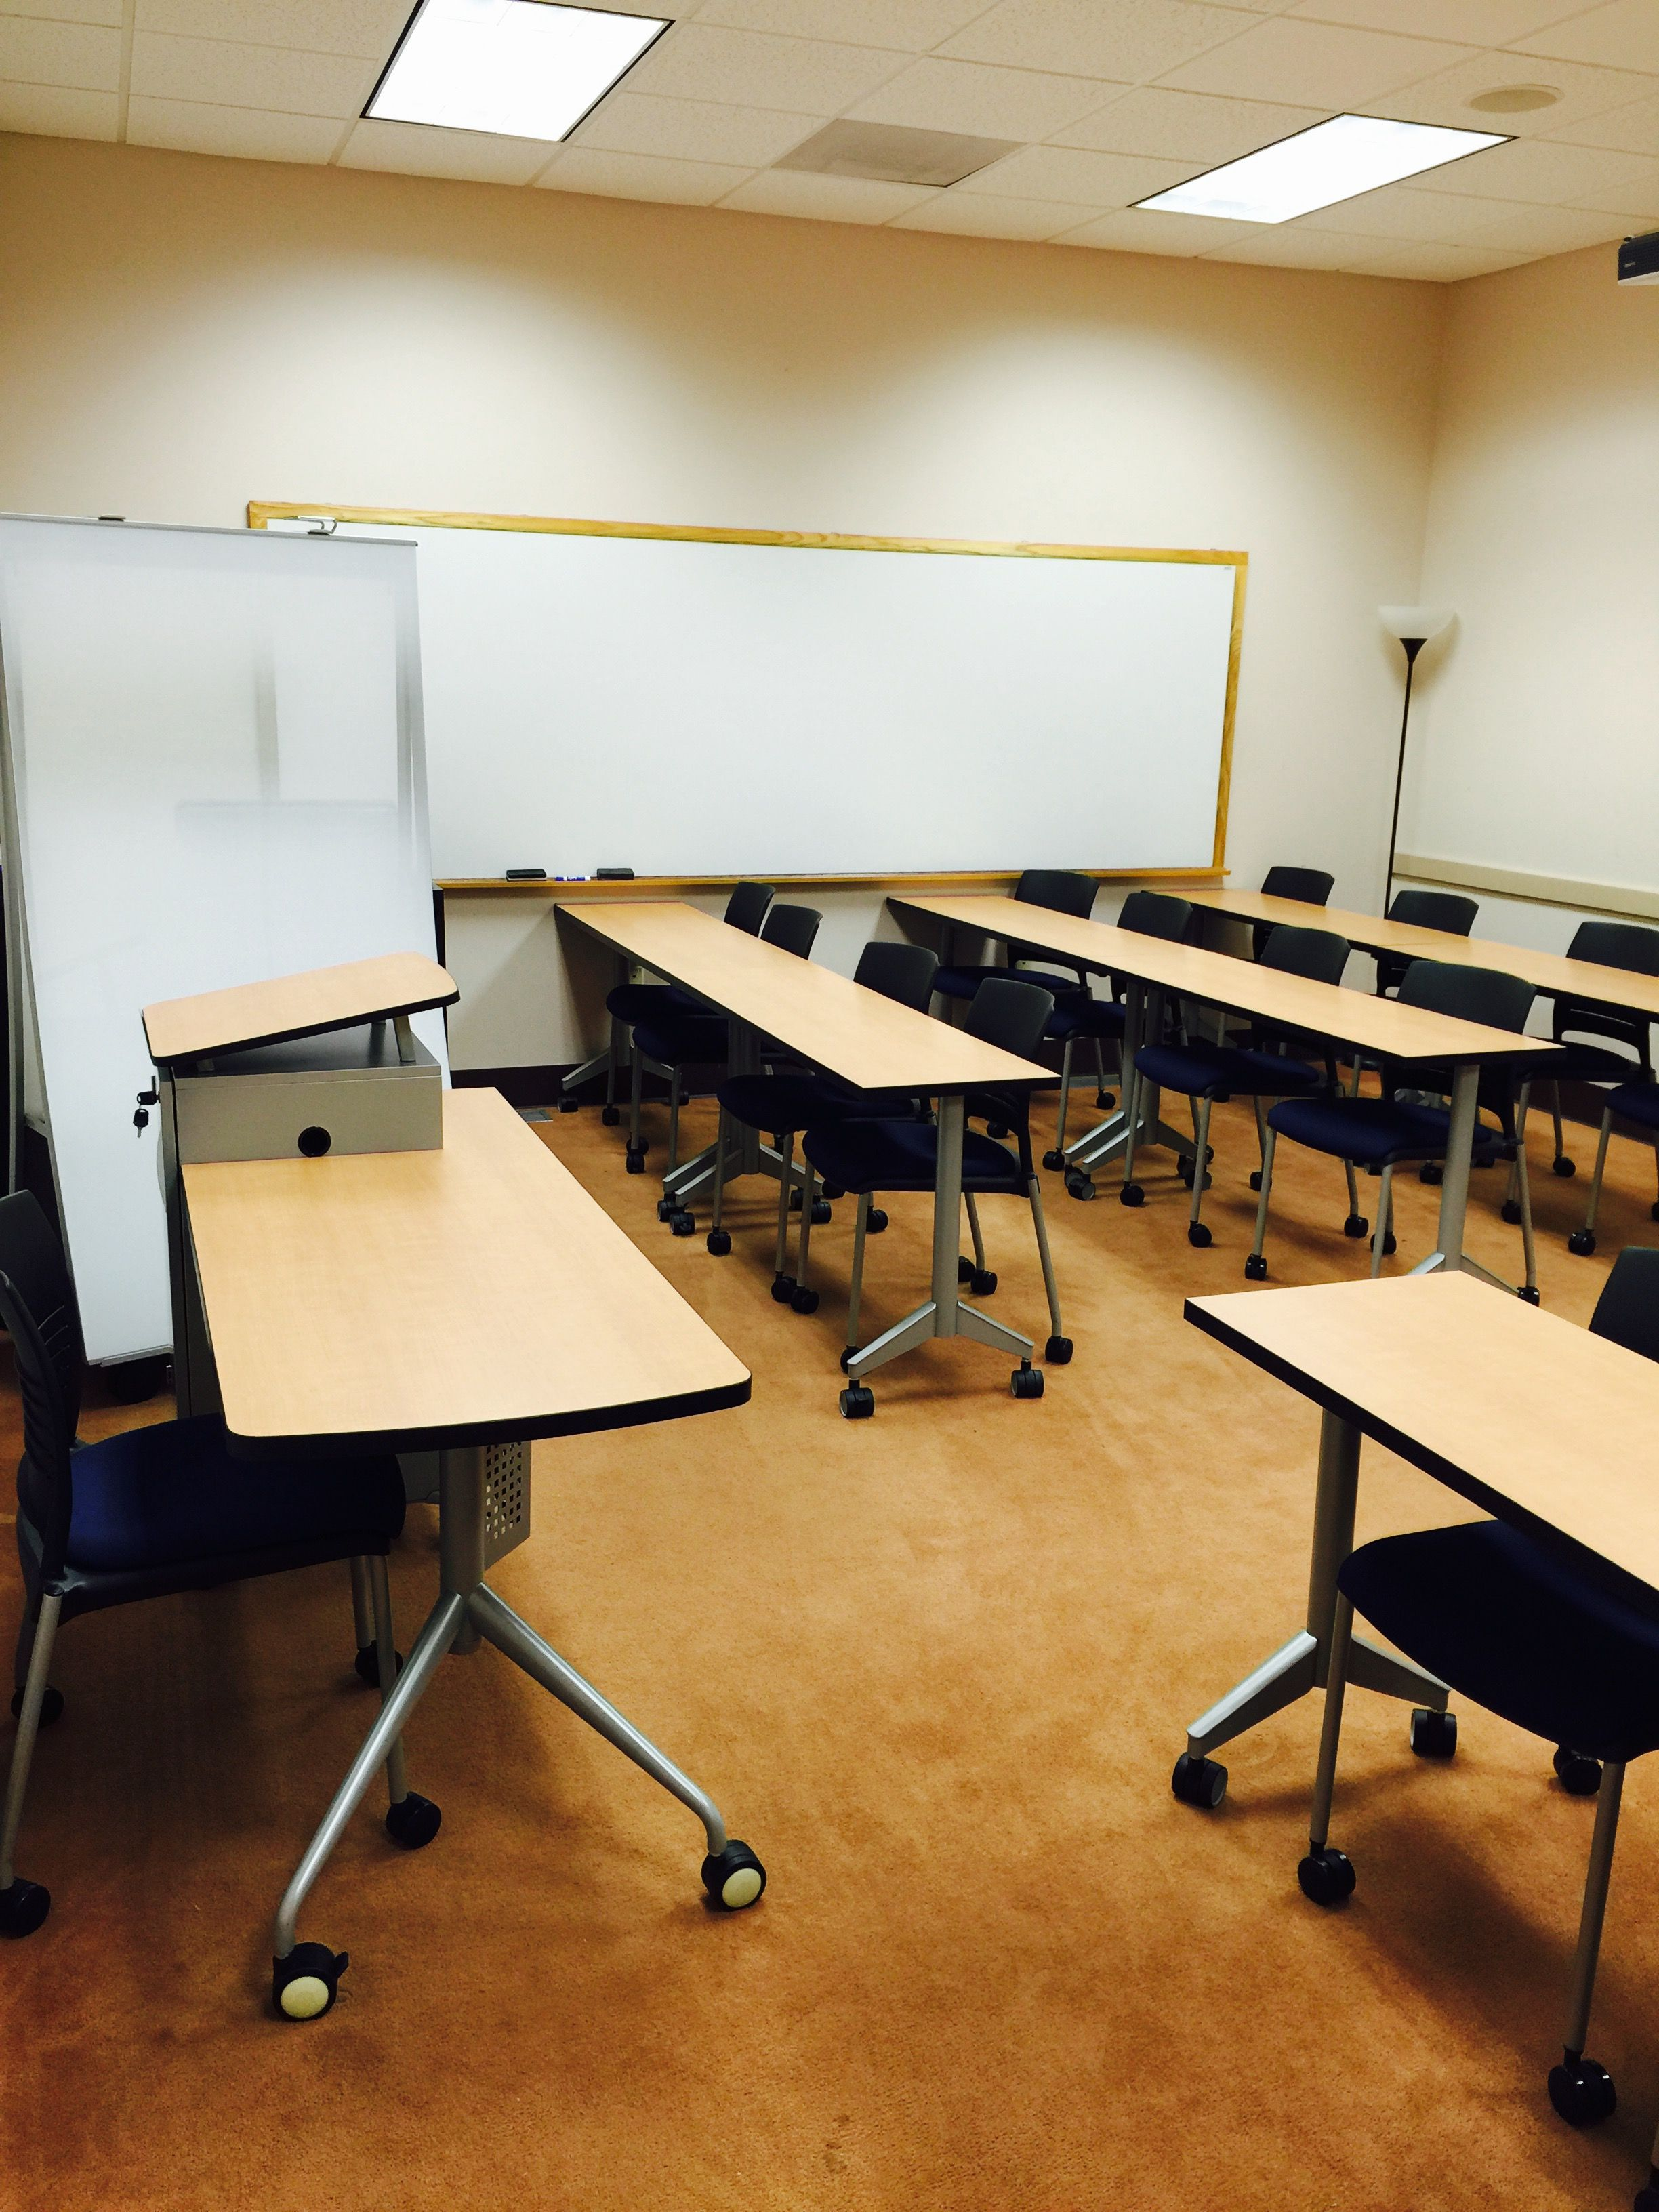 what a great install of all terrain teachers desks, pirouette